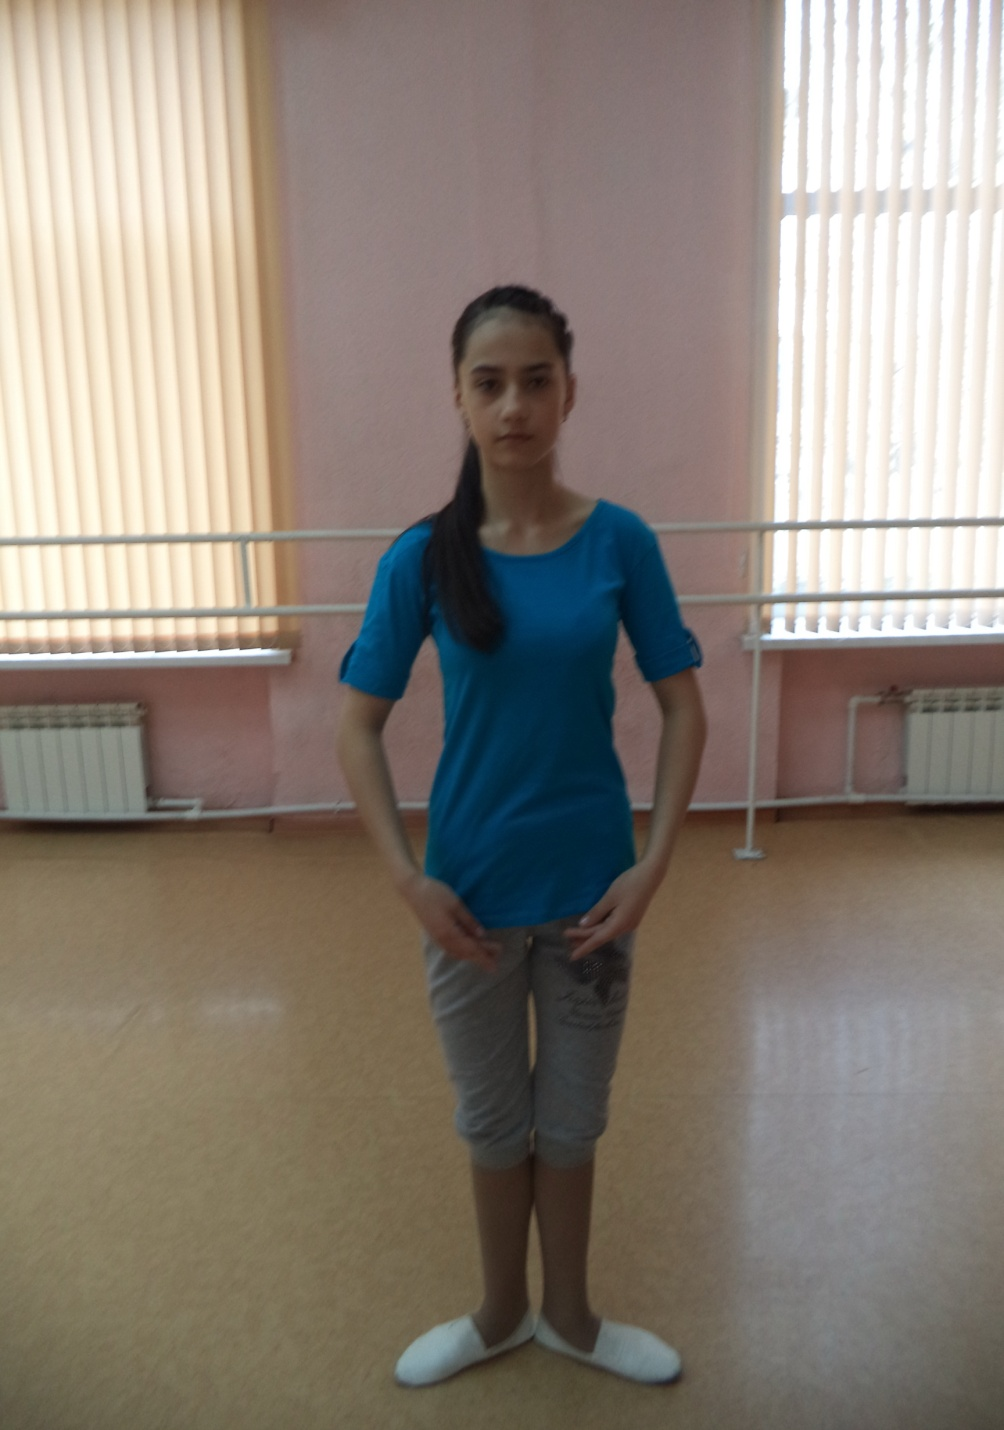 http://cl.rushkolnik.ru/tw_files2/urls_79/54/d-53948/53948_html_m1ed117df.png